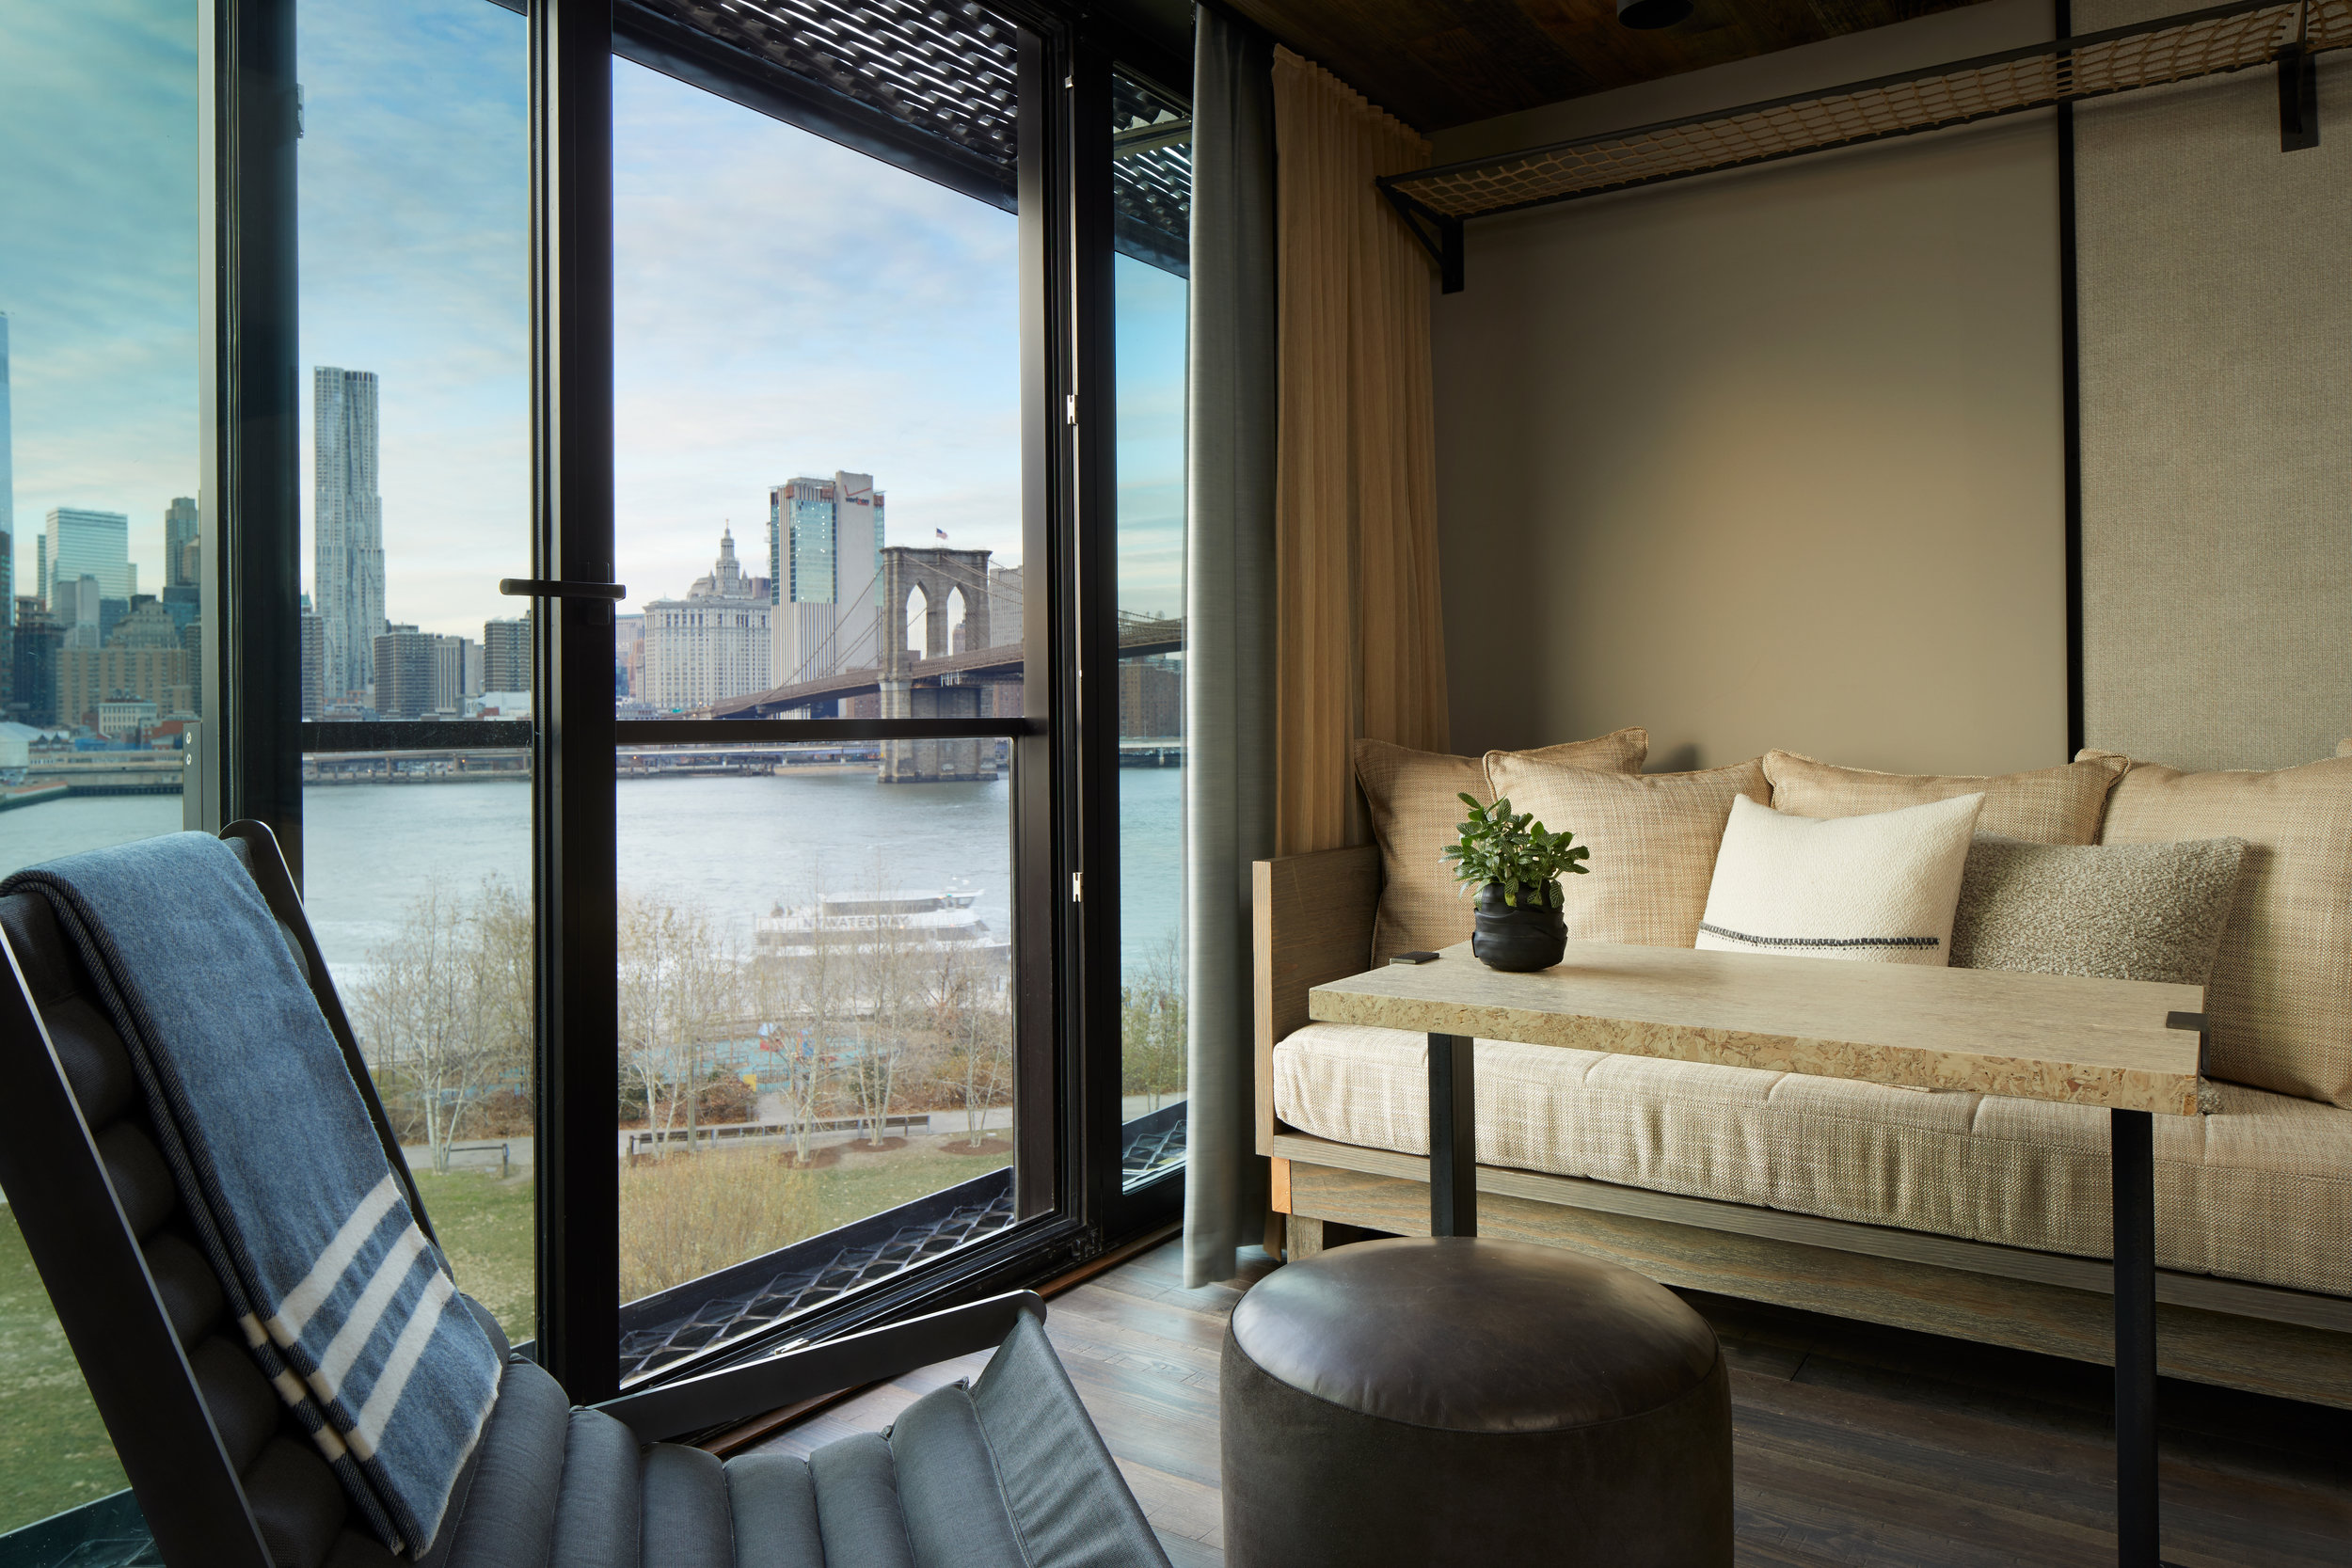 1_Hotel_Brooklyn_Bridge_King_Seating_HI (1).jpg